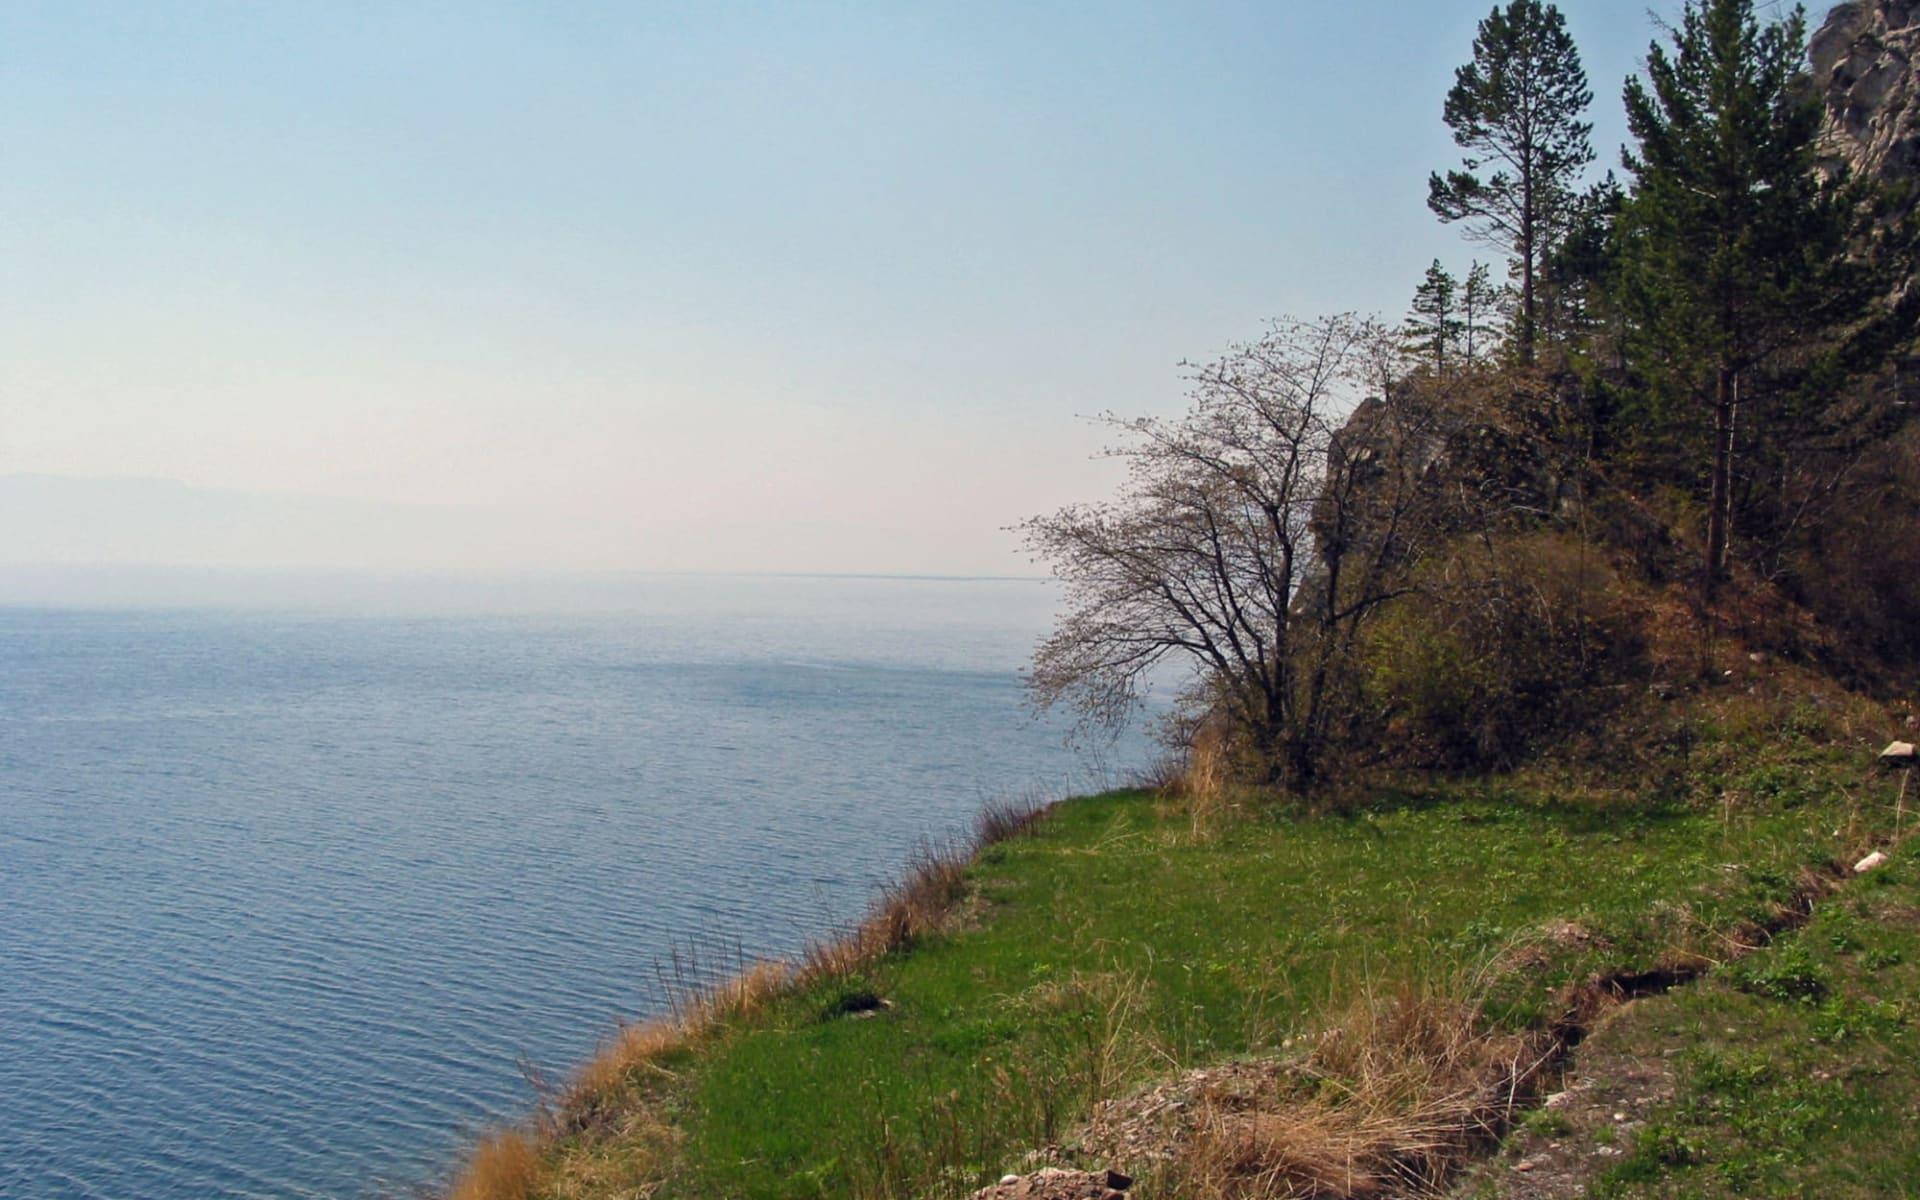 Naturwunder Baikalsee ab Irkutsk: Russland - Baikalsee - Hang